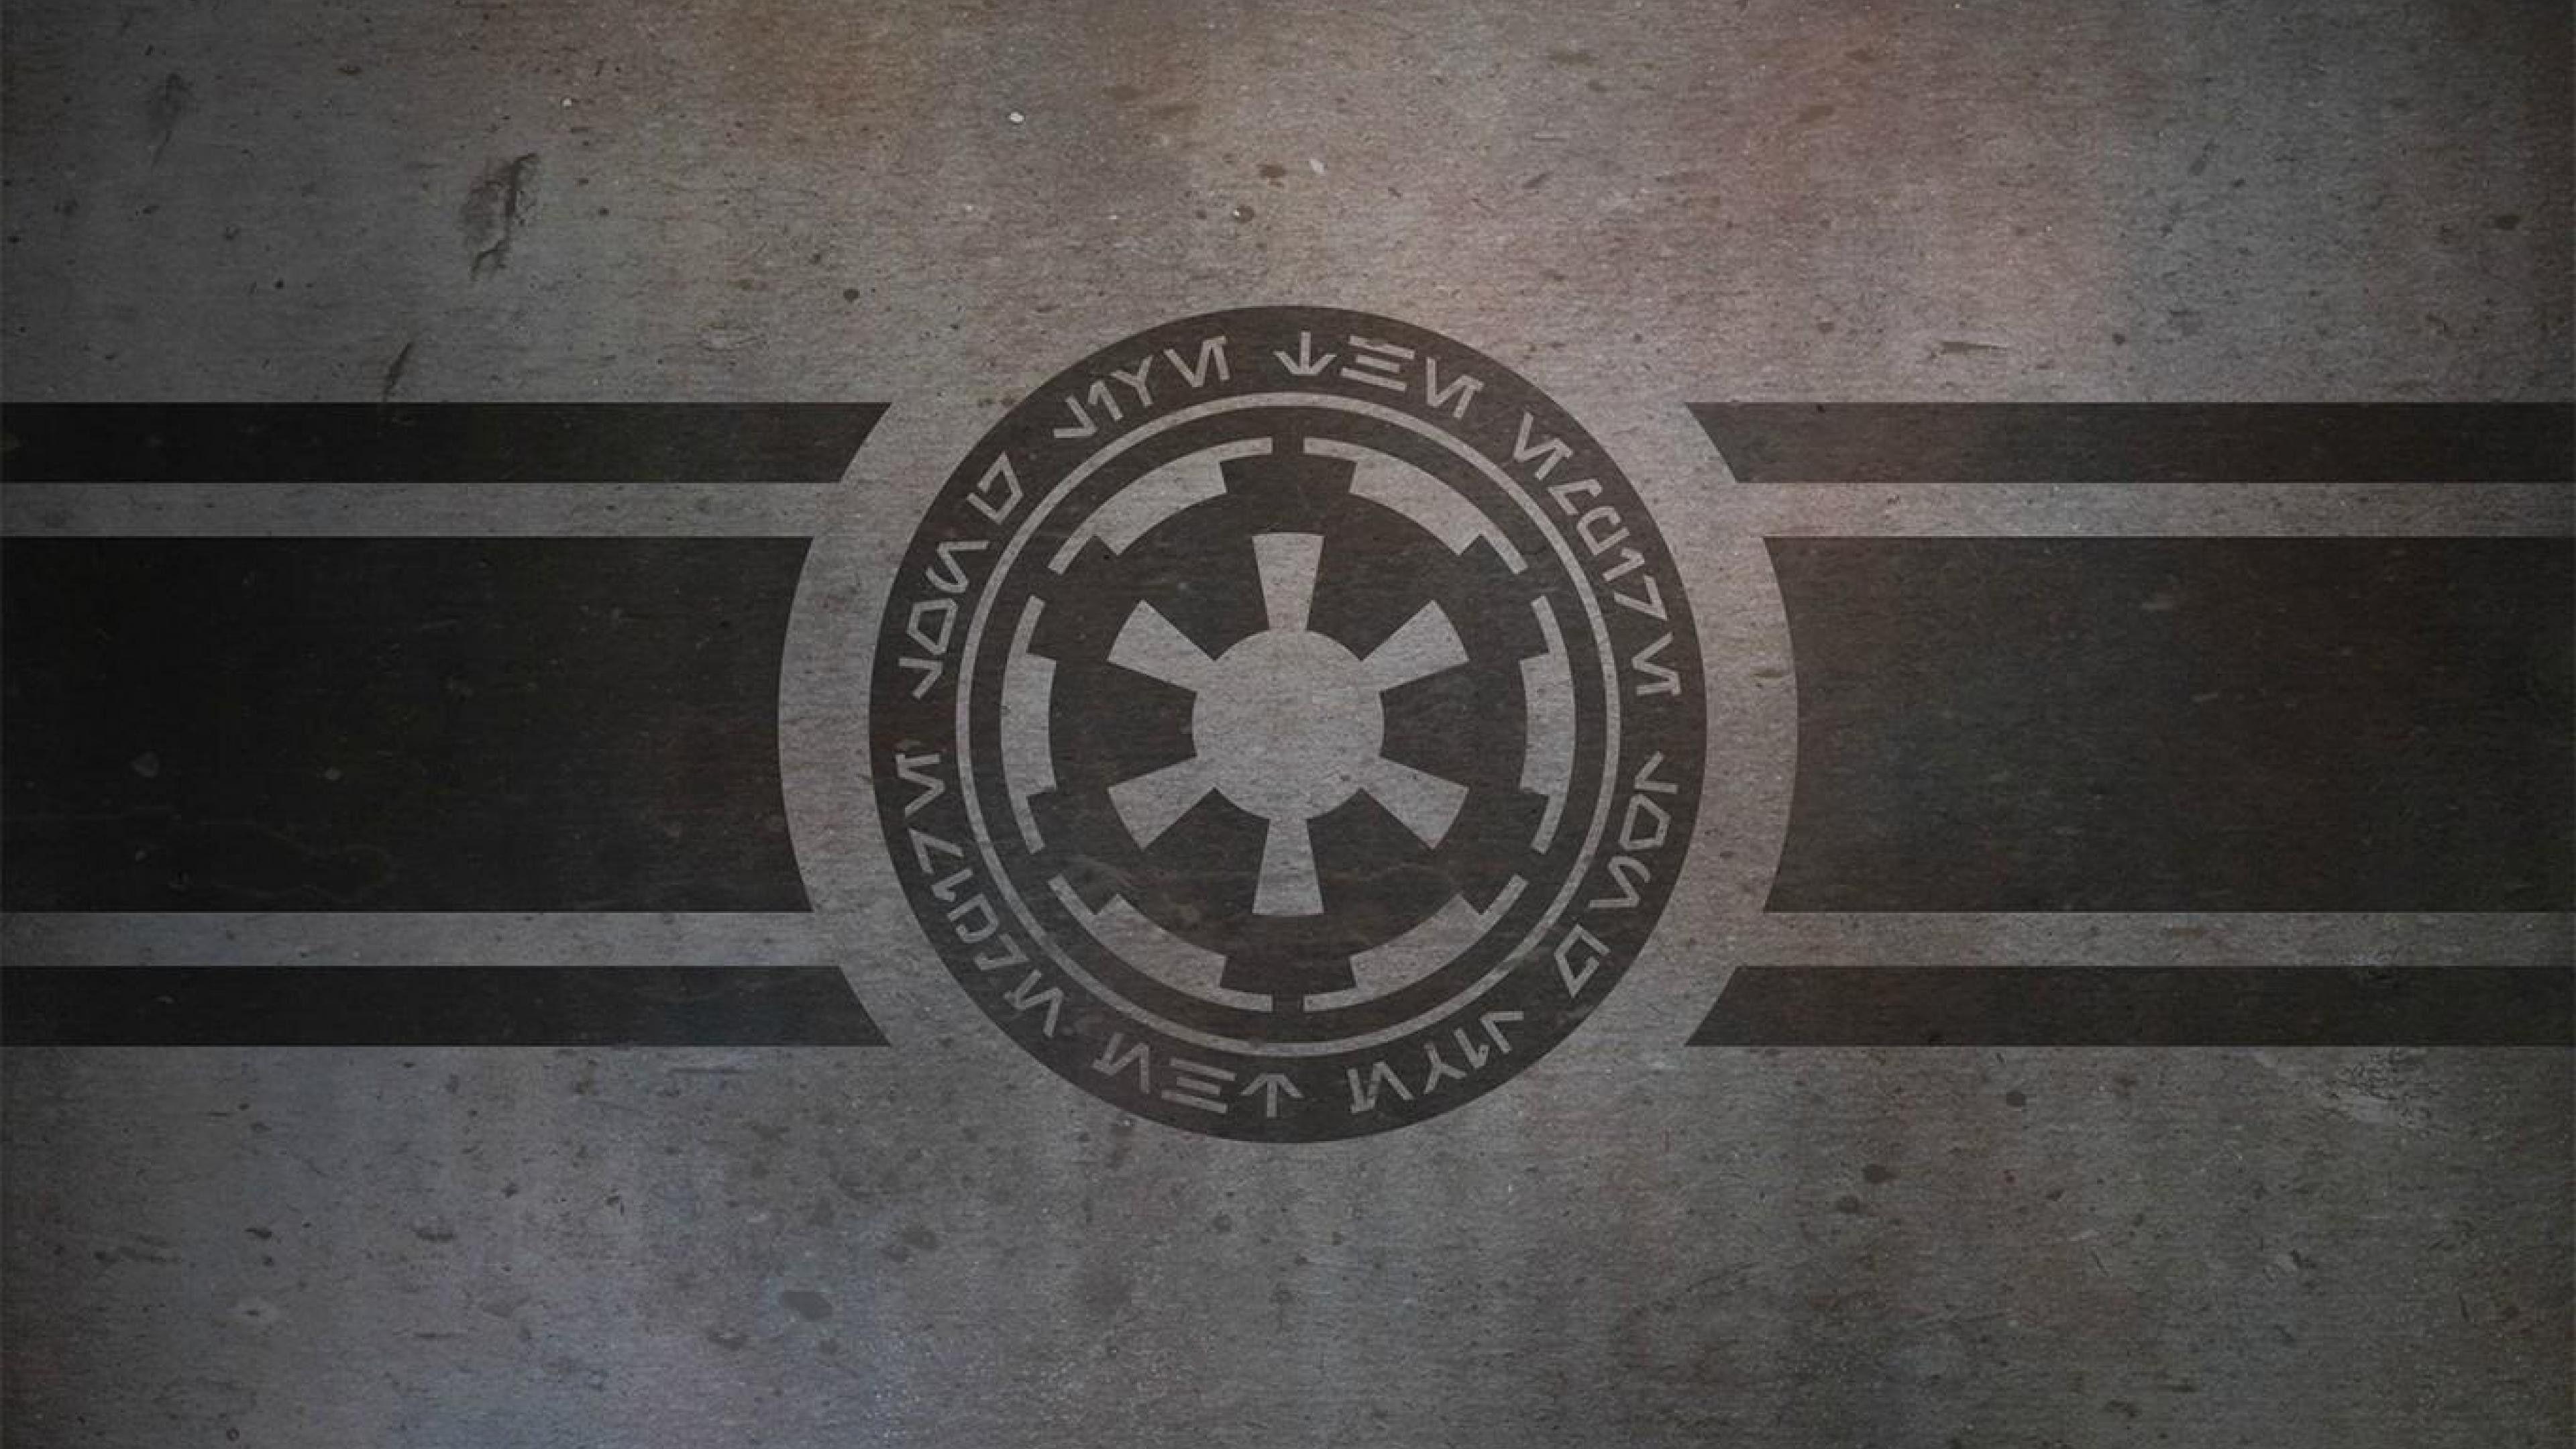 3840x2160 Galactic Empire Wallpapers On Wallpaper Hd 3840 X 2160 Px 2 43 Mb Fleet Jedi Order Hd Star Wars Wallpaper Empire Wallpaper Star Wars Humor